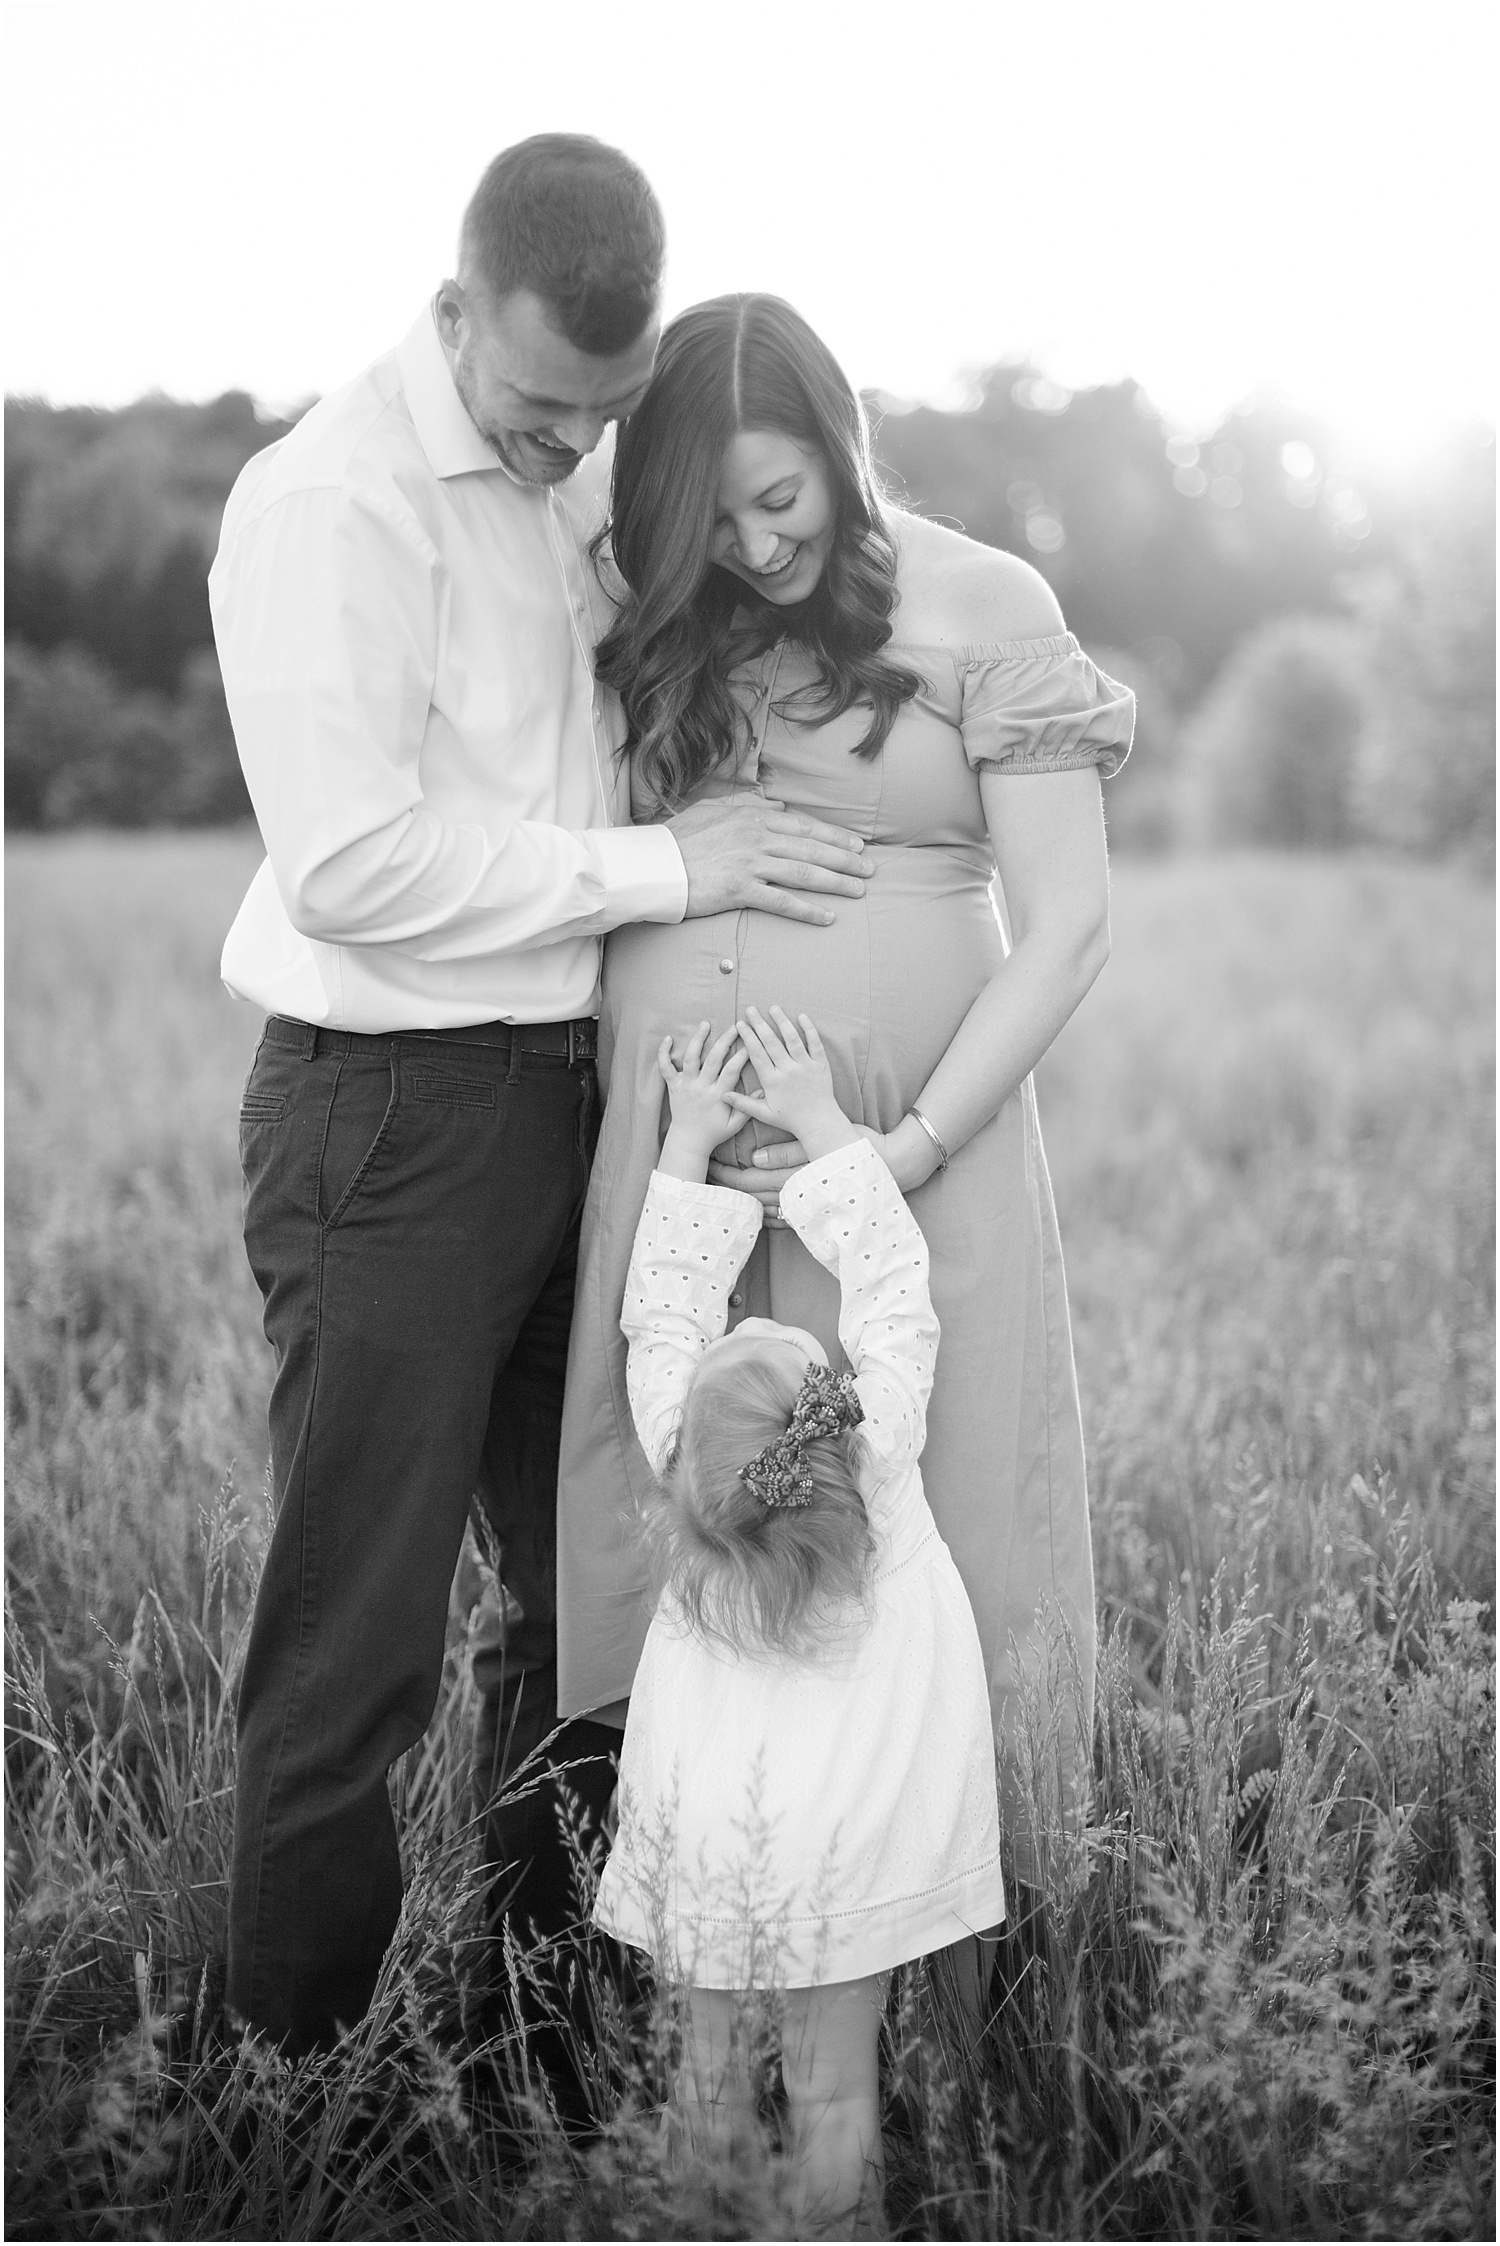 astleigh hill maternity session_0007.jpg